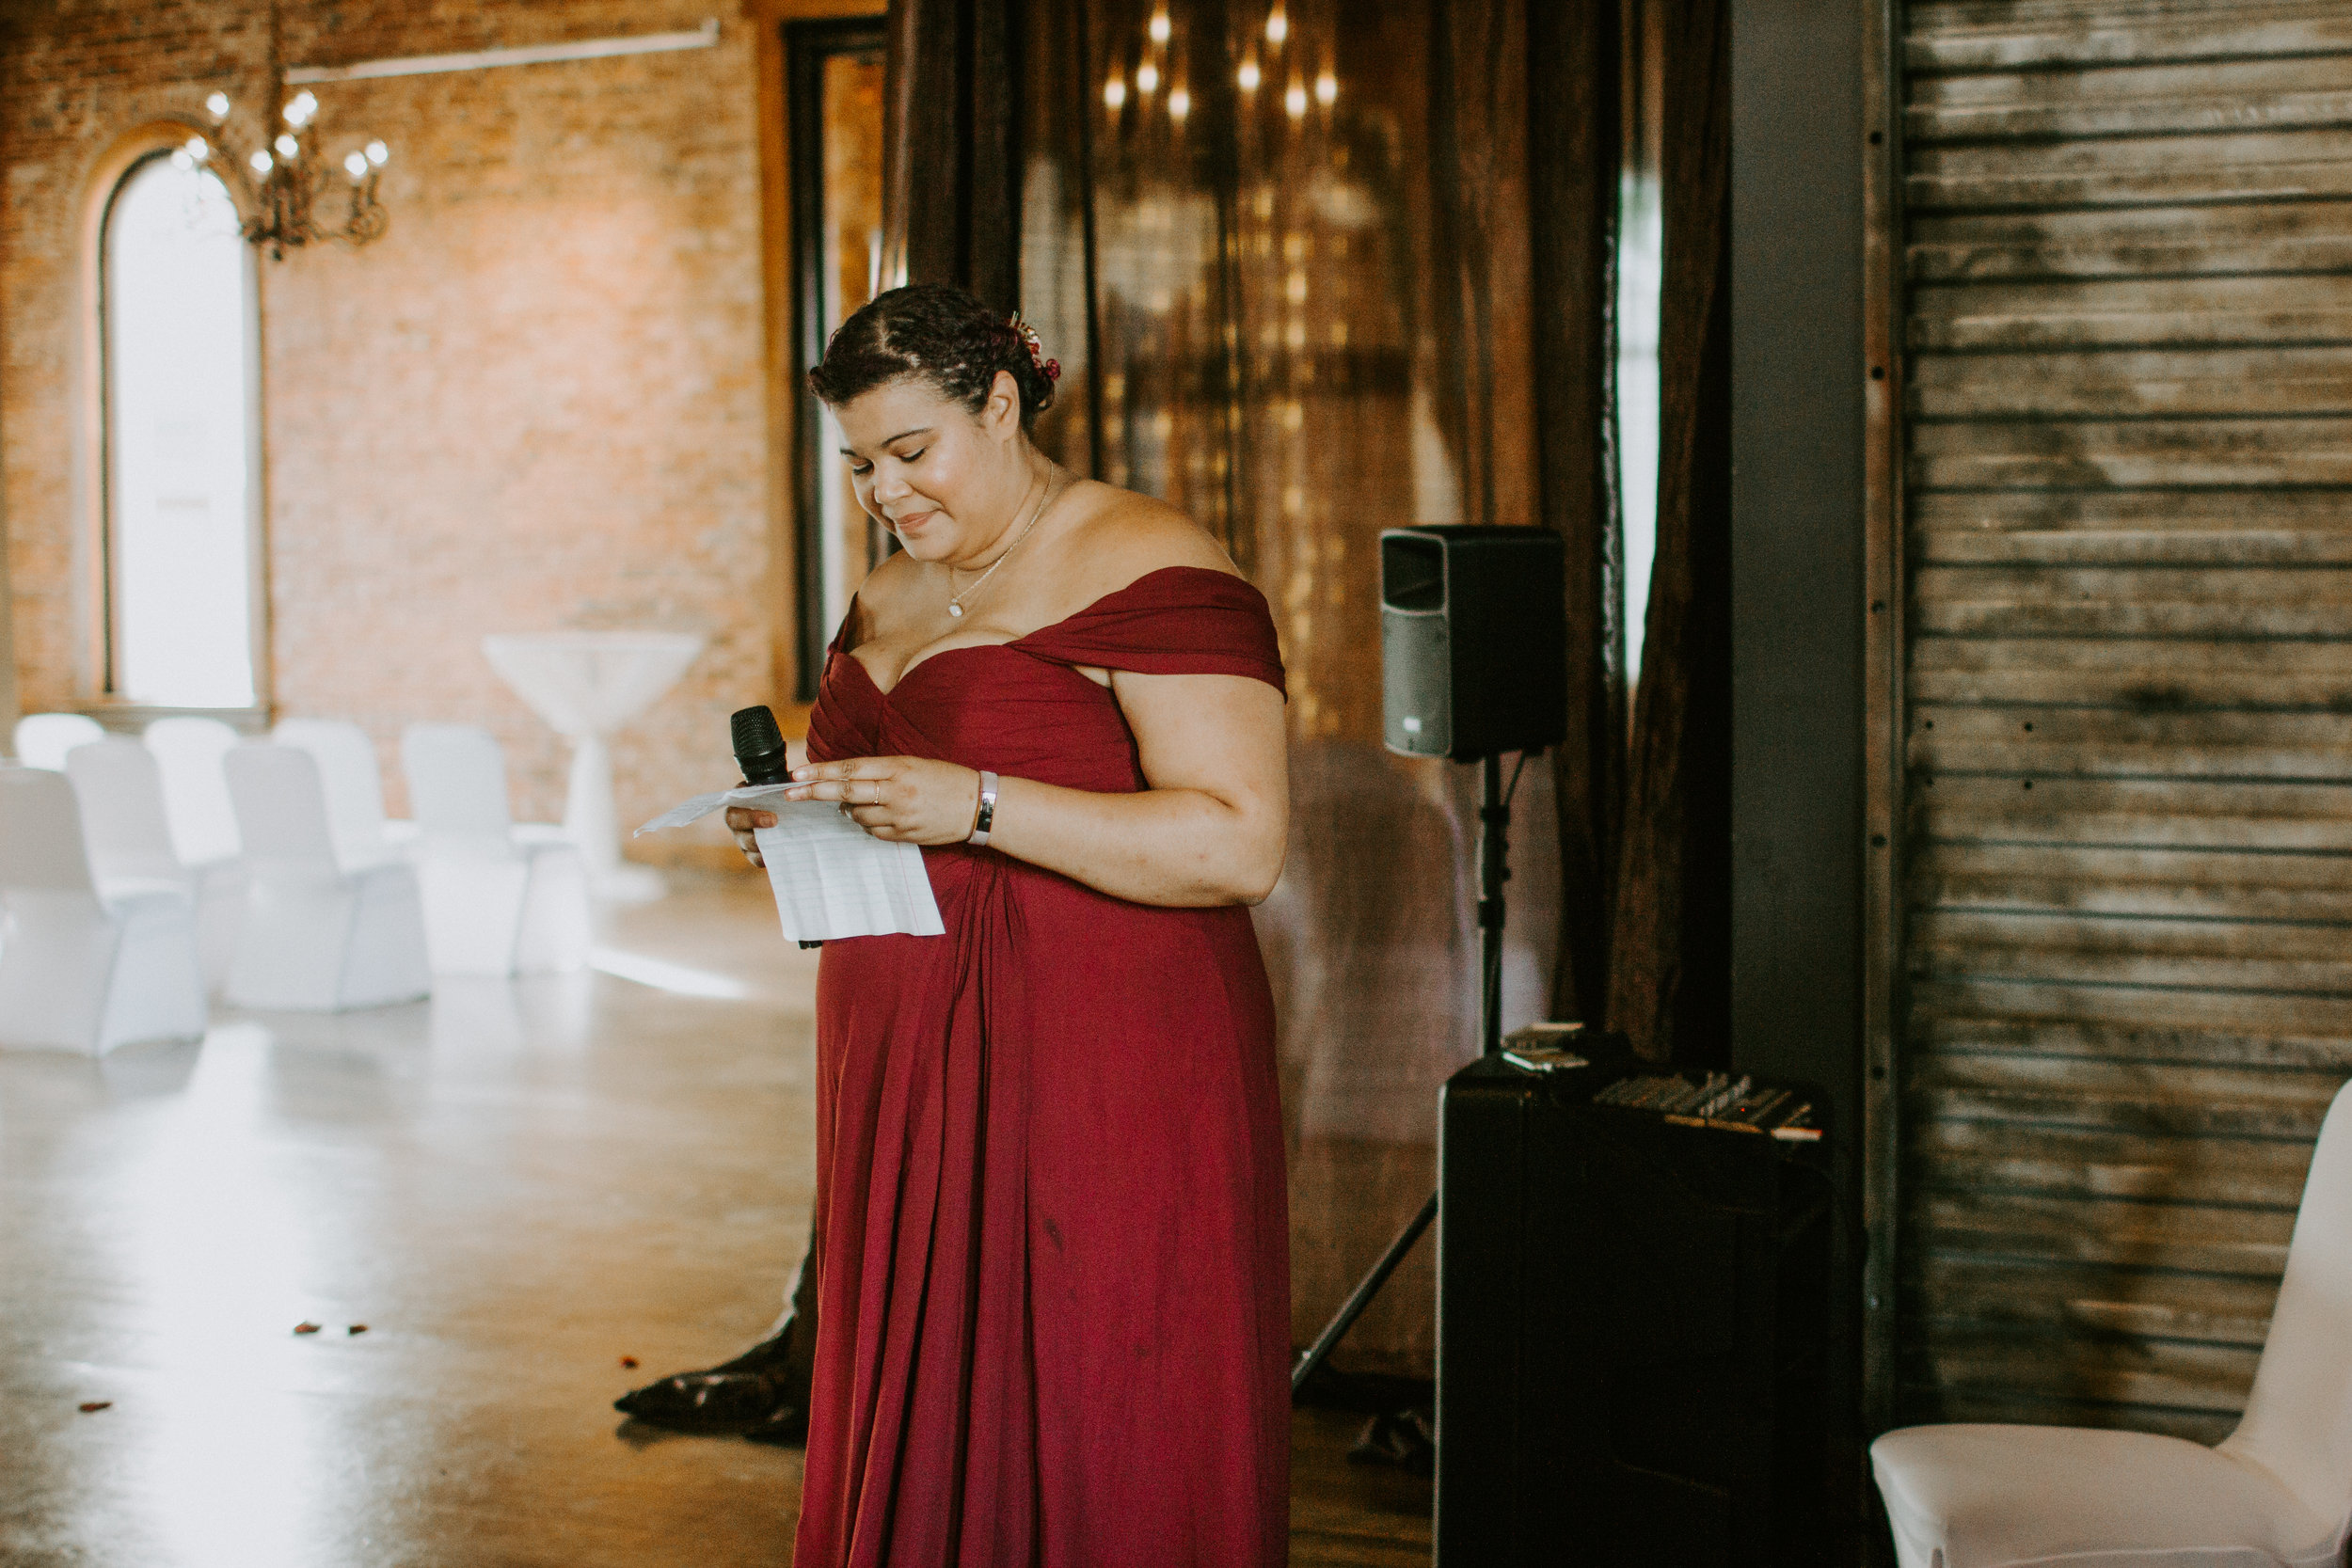 WonderlyCreative_Wedding_6.7.18_Khara&Dwayne_-848.jpg